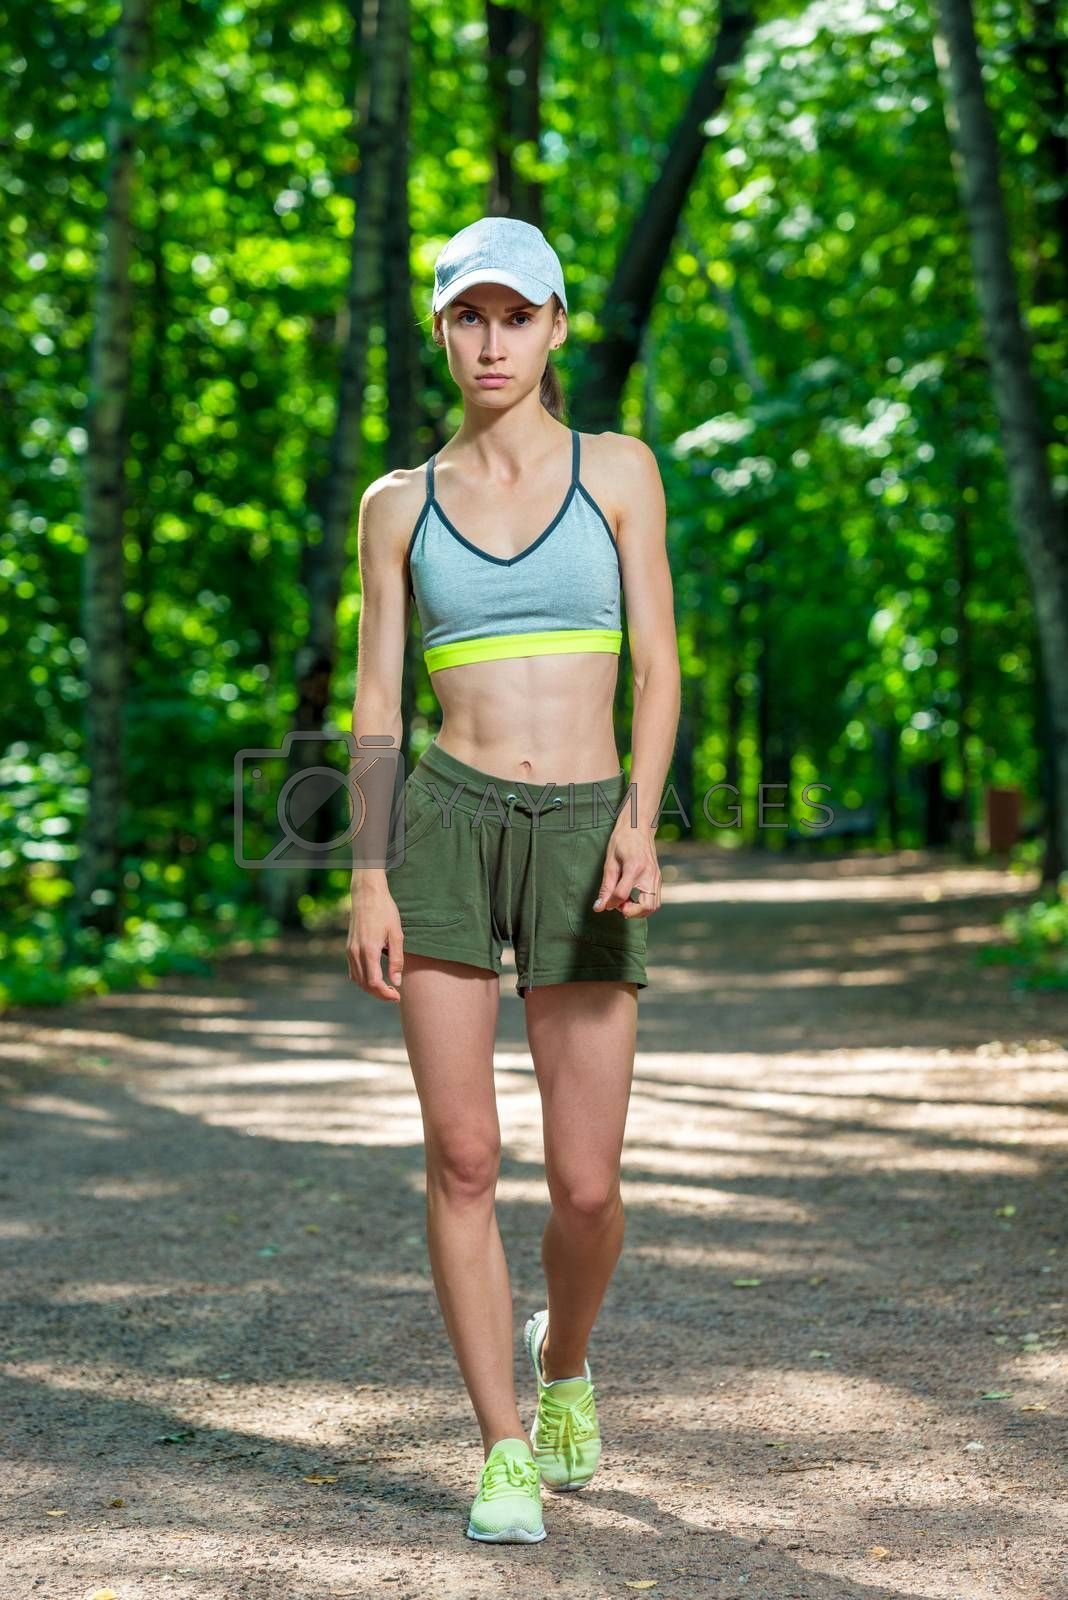 full length portrait of a female athlete in a summer park by Labunskiy K.